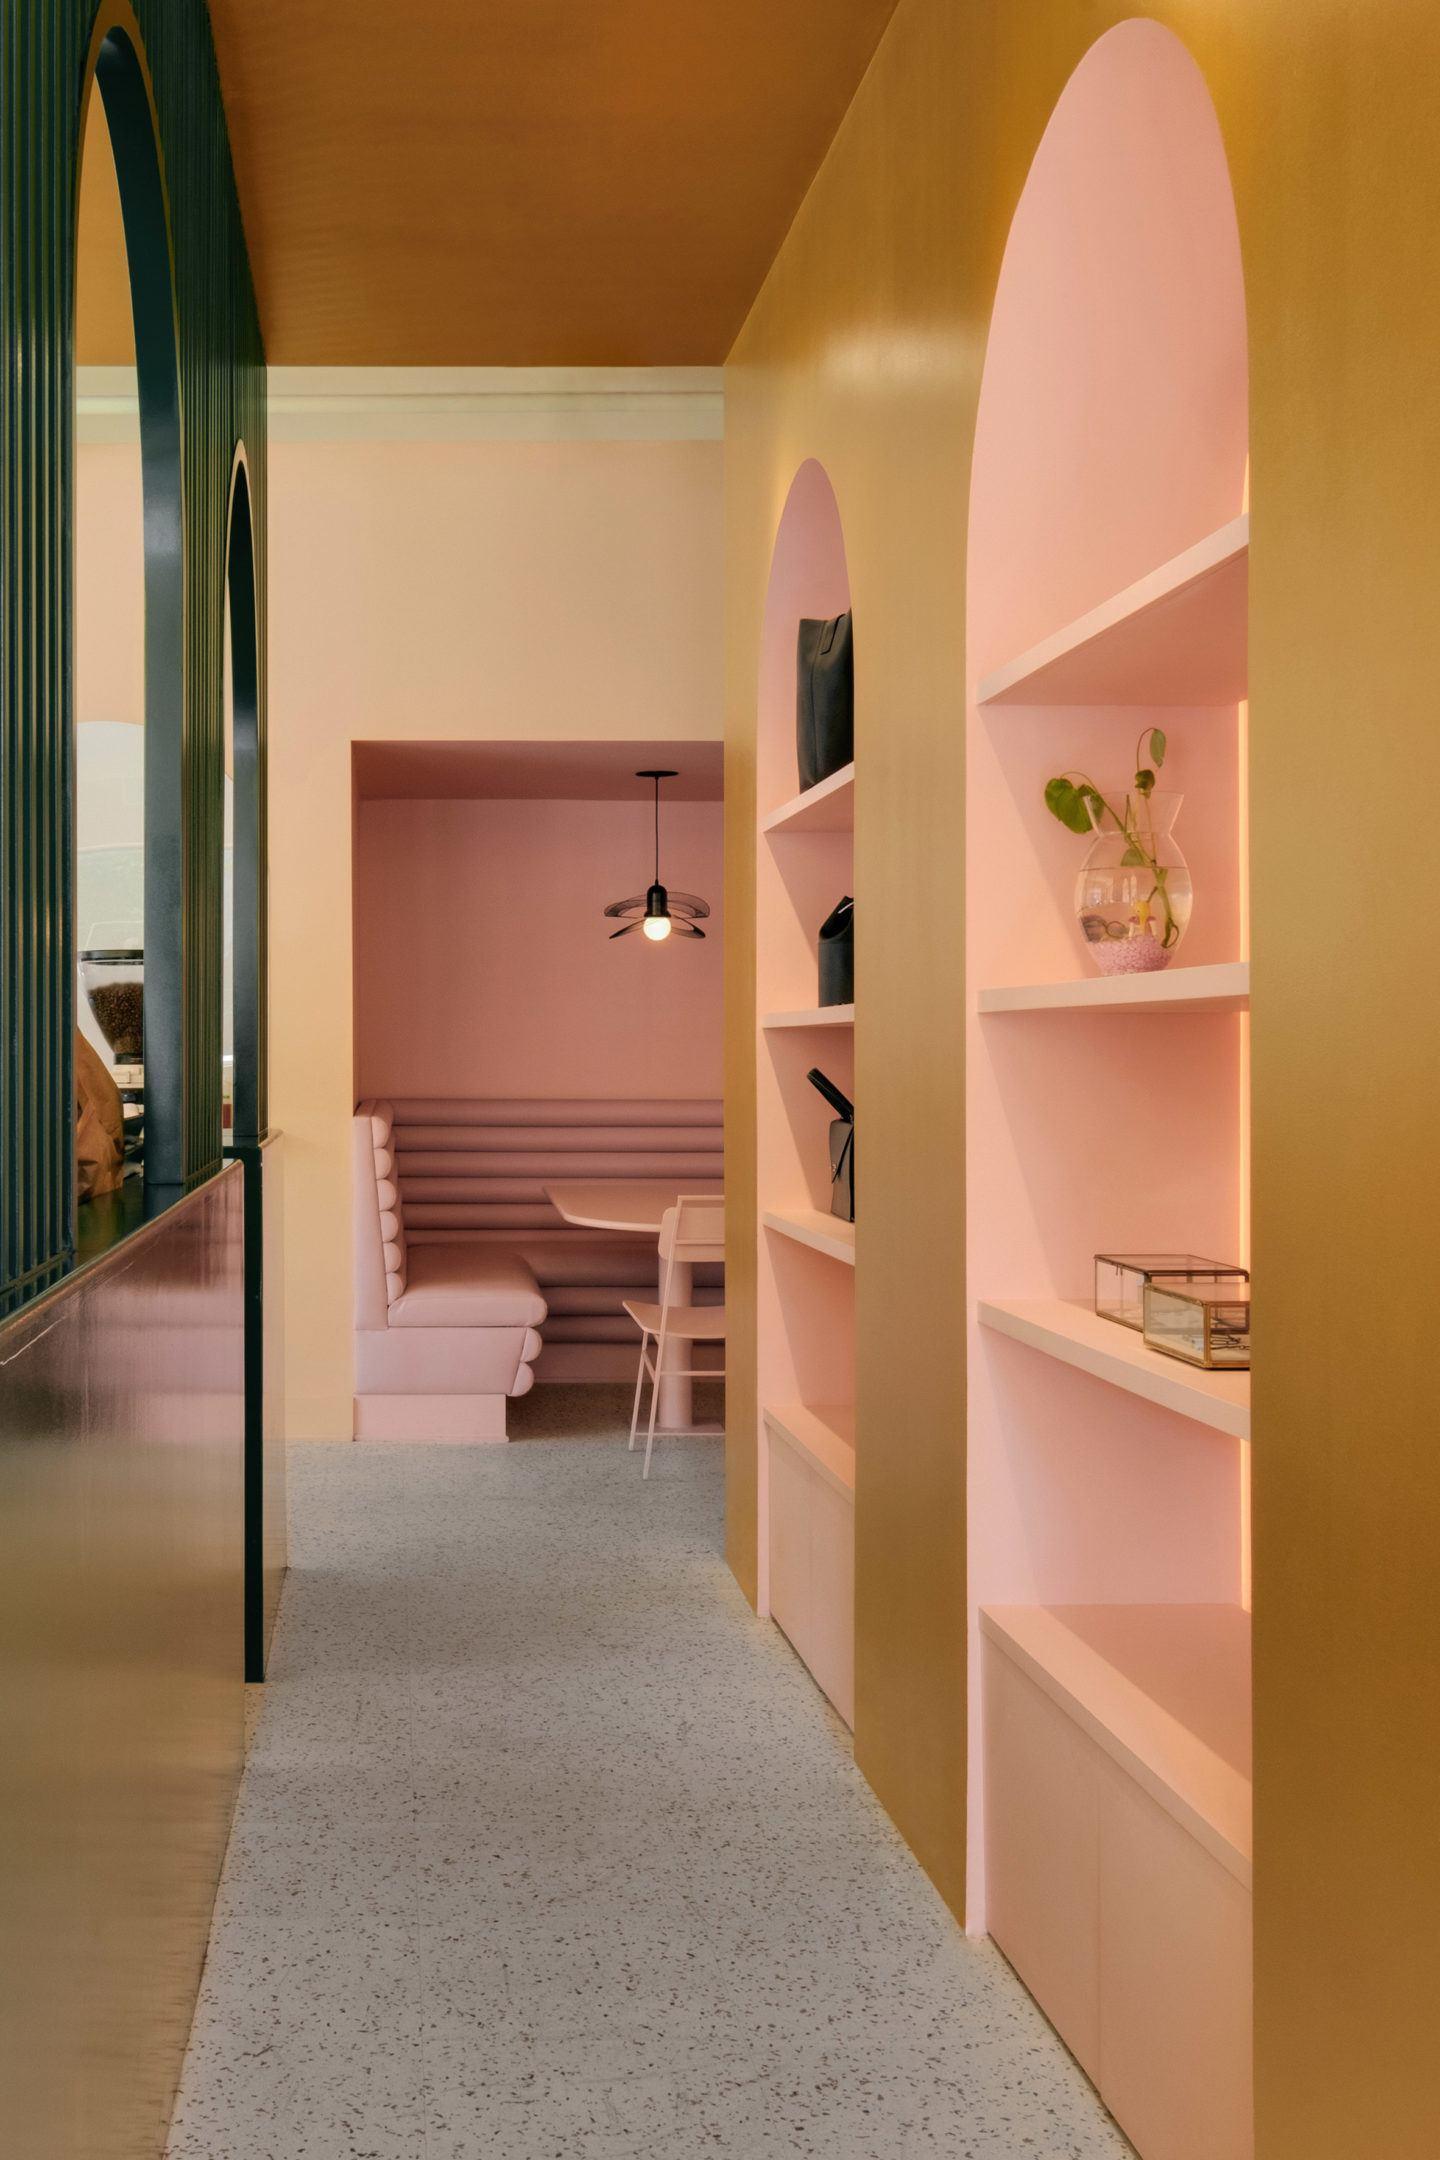 IGNANT-Architecture-Appareil-Architects-Pastel-Rita-Cafe-003